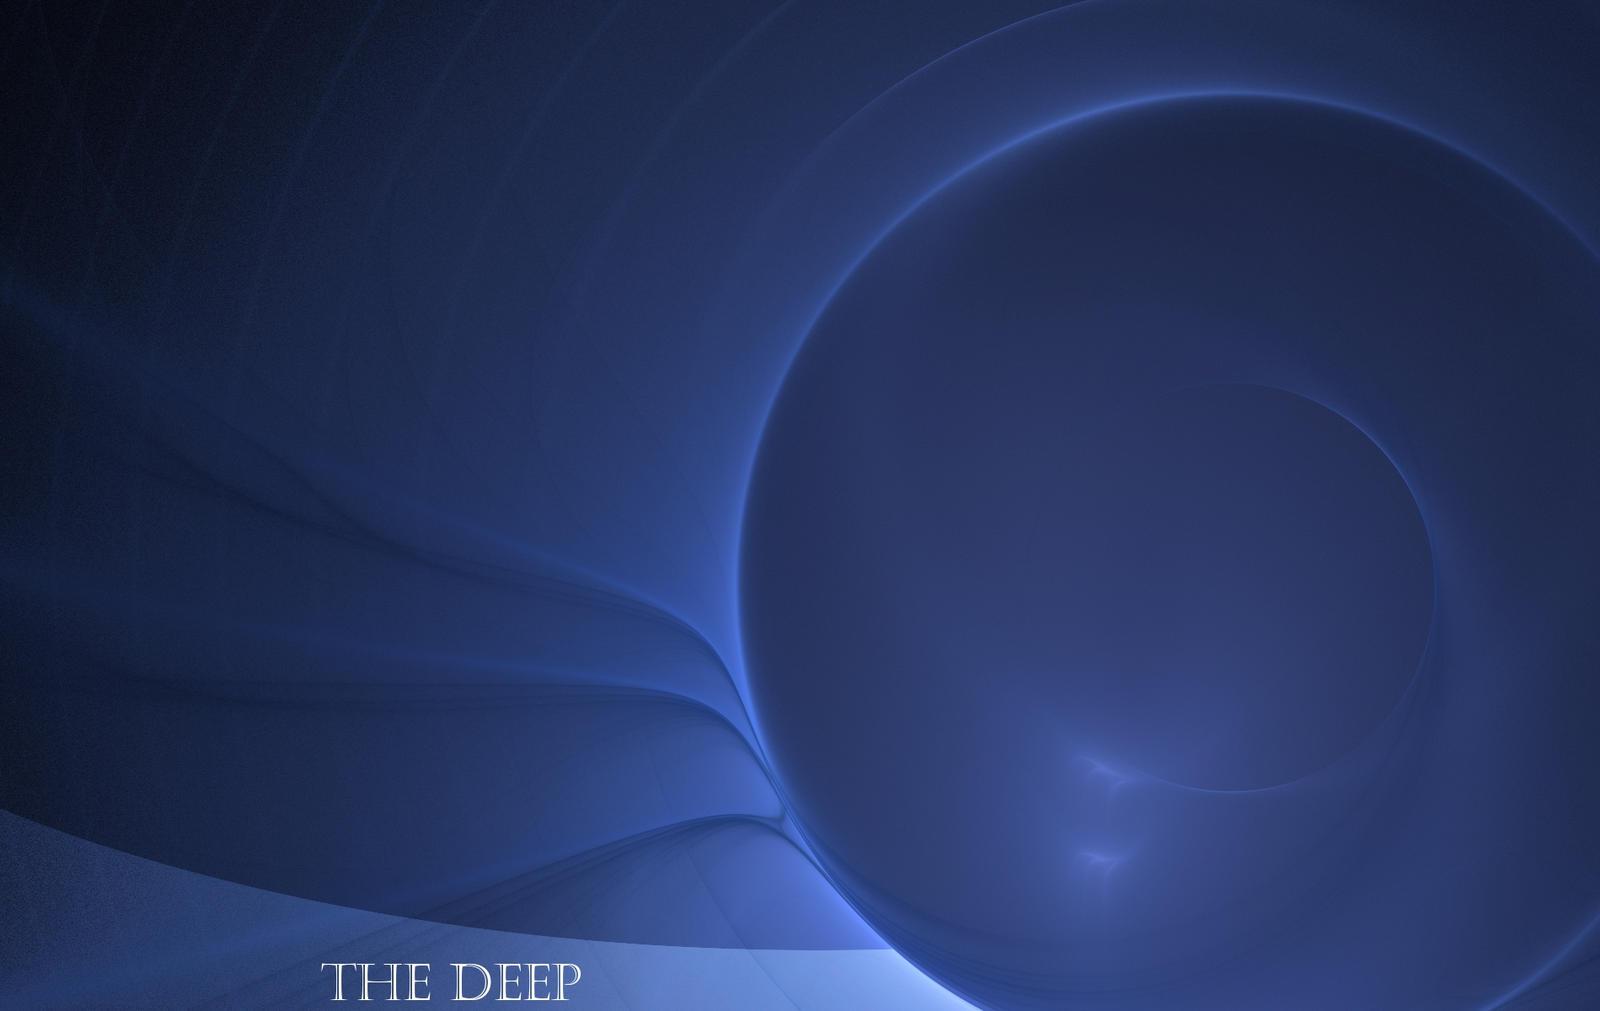 The deep by AL3KSAND3R